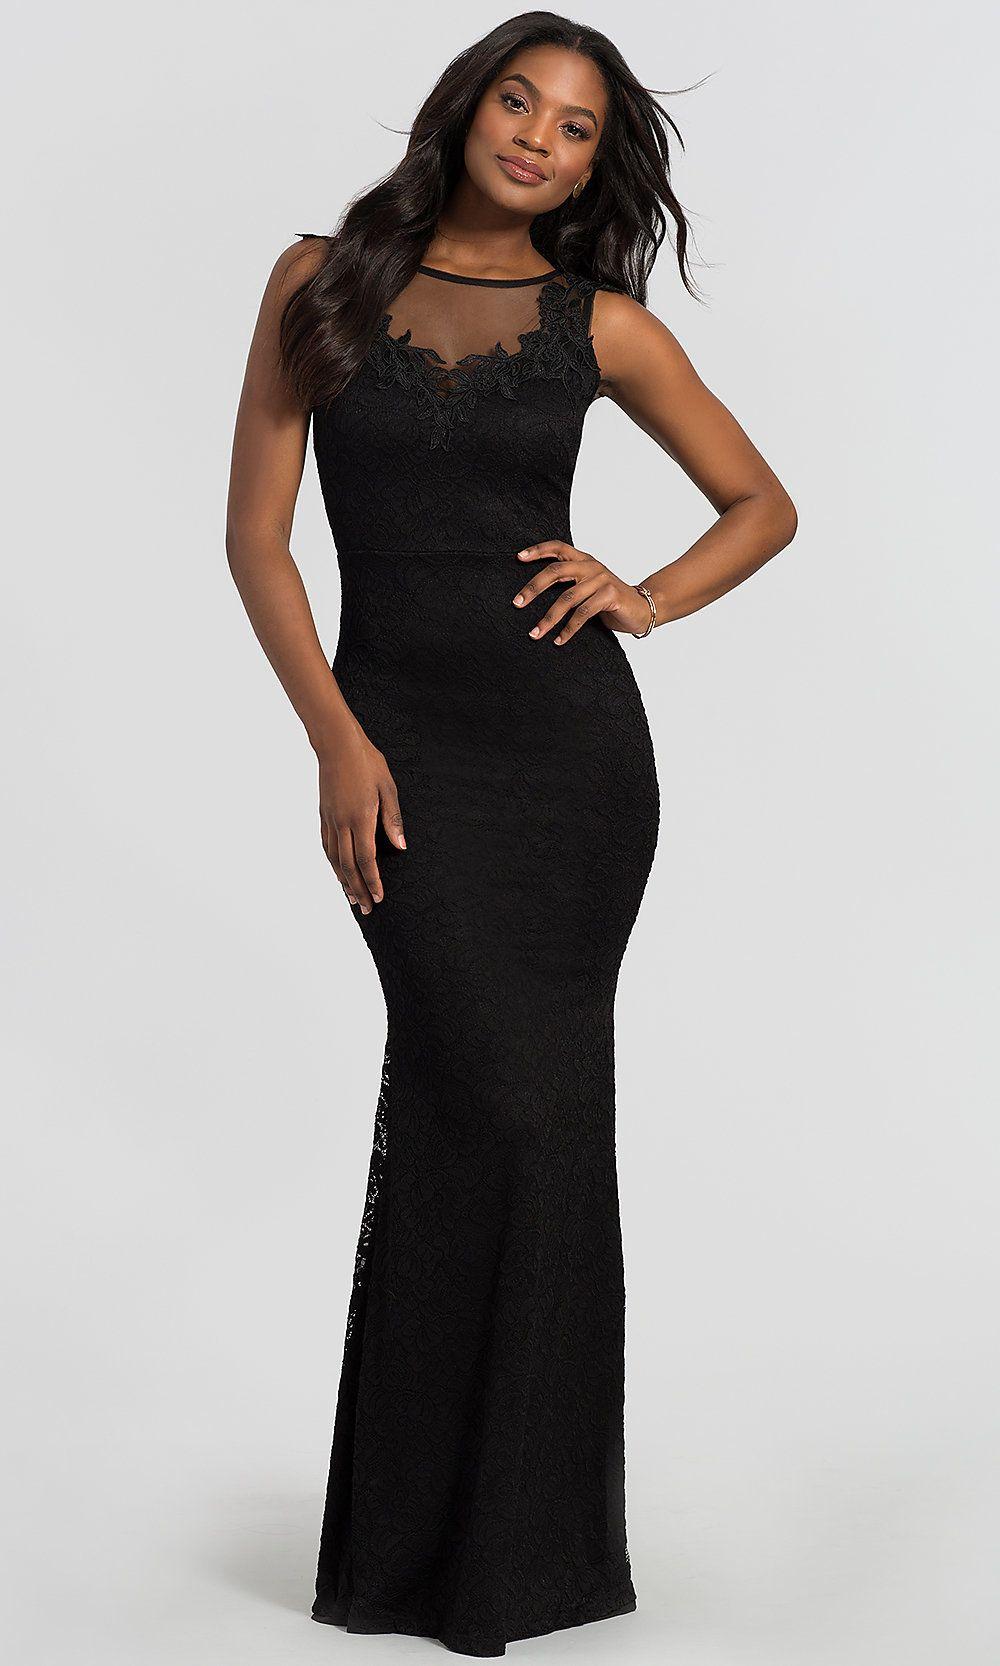 5e5f1f2eda7e1 ILLUSION-NECK LONG BLACK LACE WEDDING GUEST DRESS   Best Dressed ...